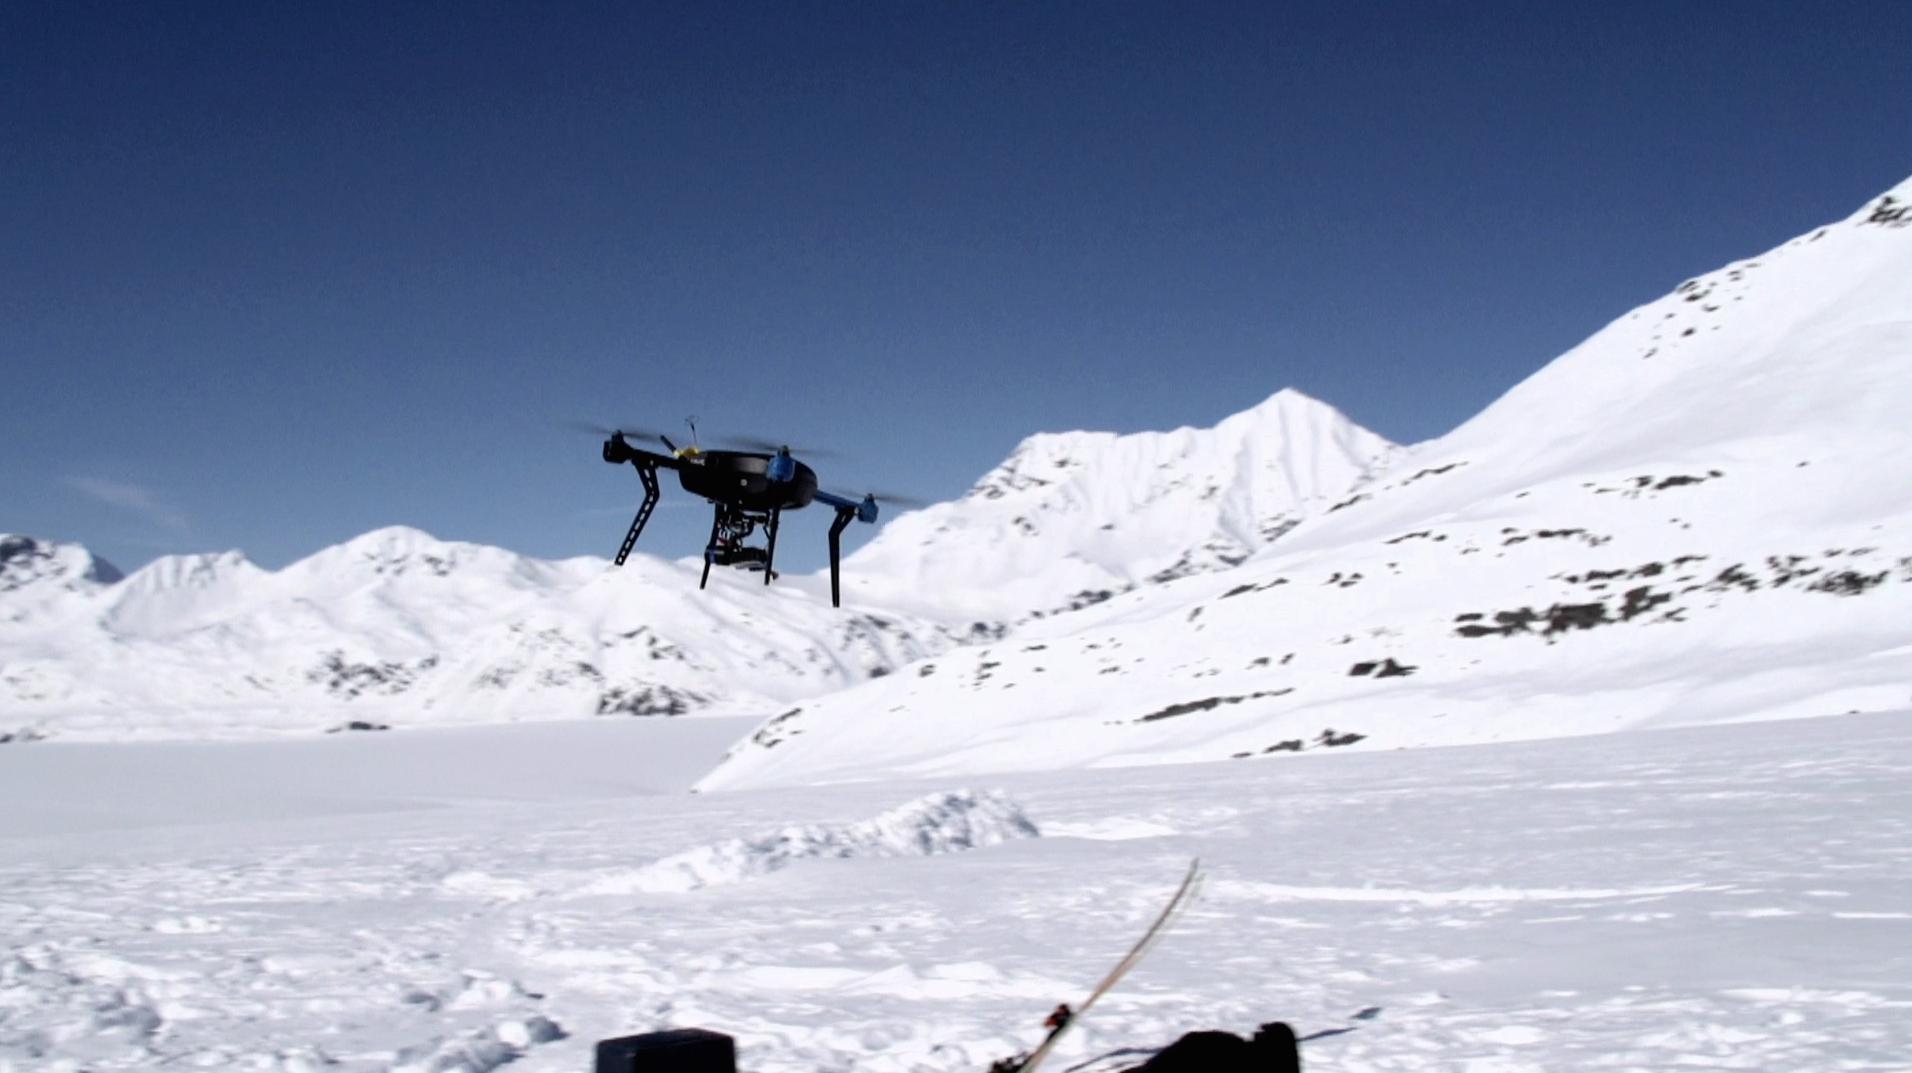 Robots In Alaska: The Making of Sugar Mountain by Daniel Coolahan, Oscar McLennan, Brandon Basso, Adam Schlender, 3D Robotics, Richard James, Rob Norman